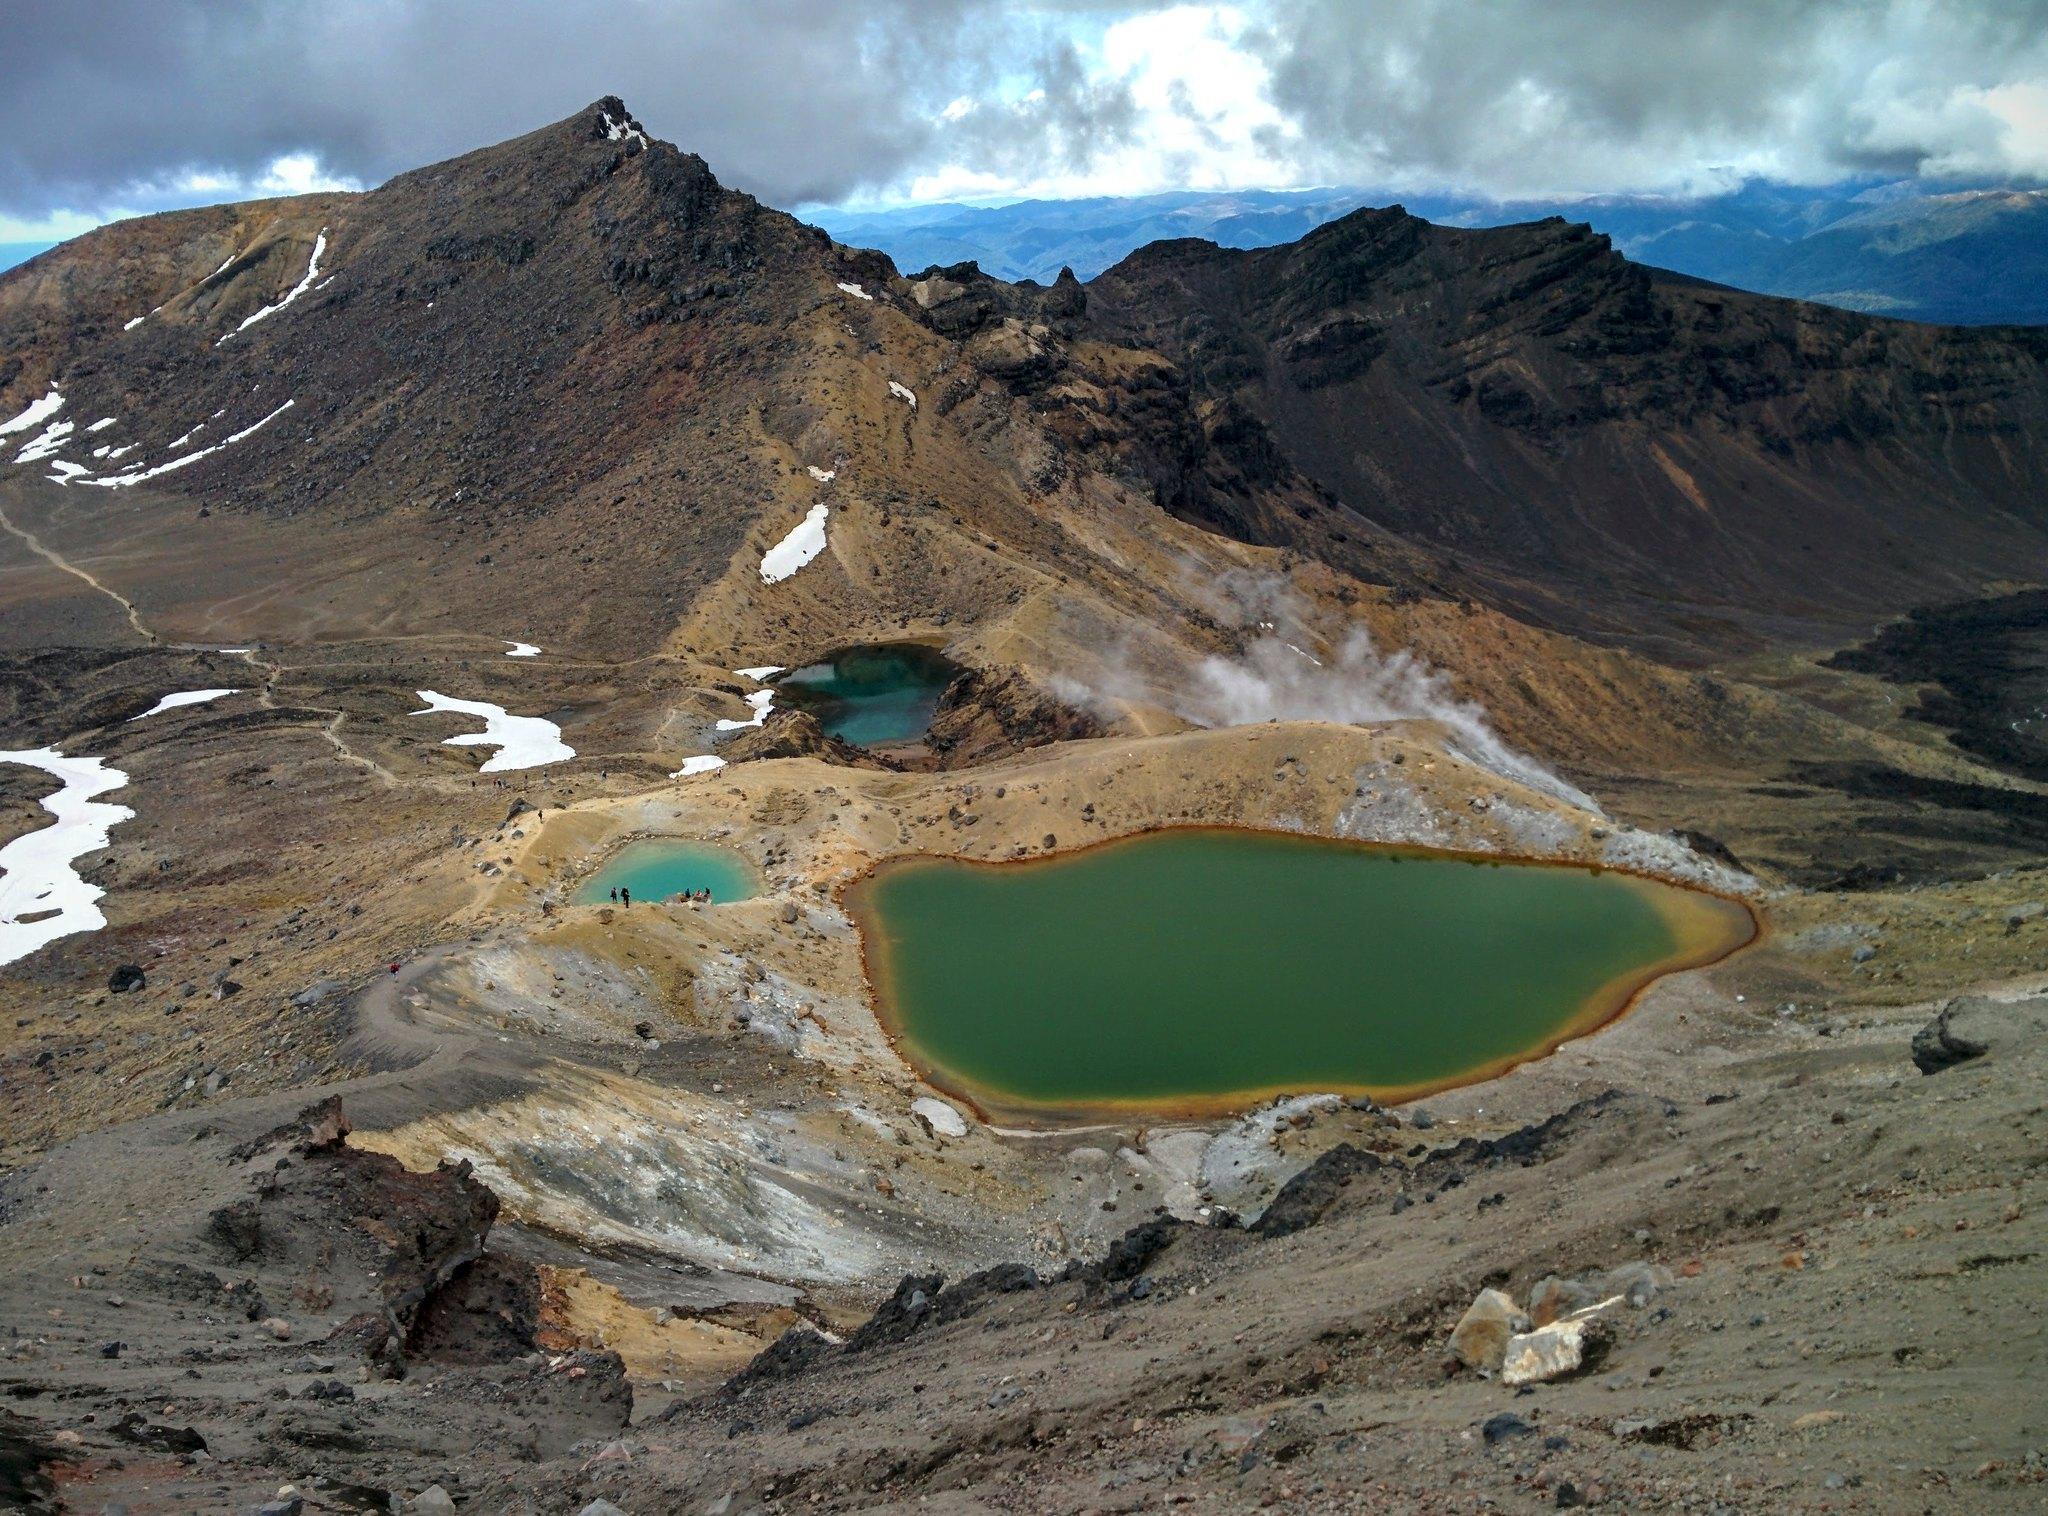 The emerald lakes from Tongariro